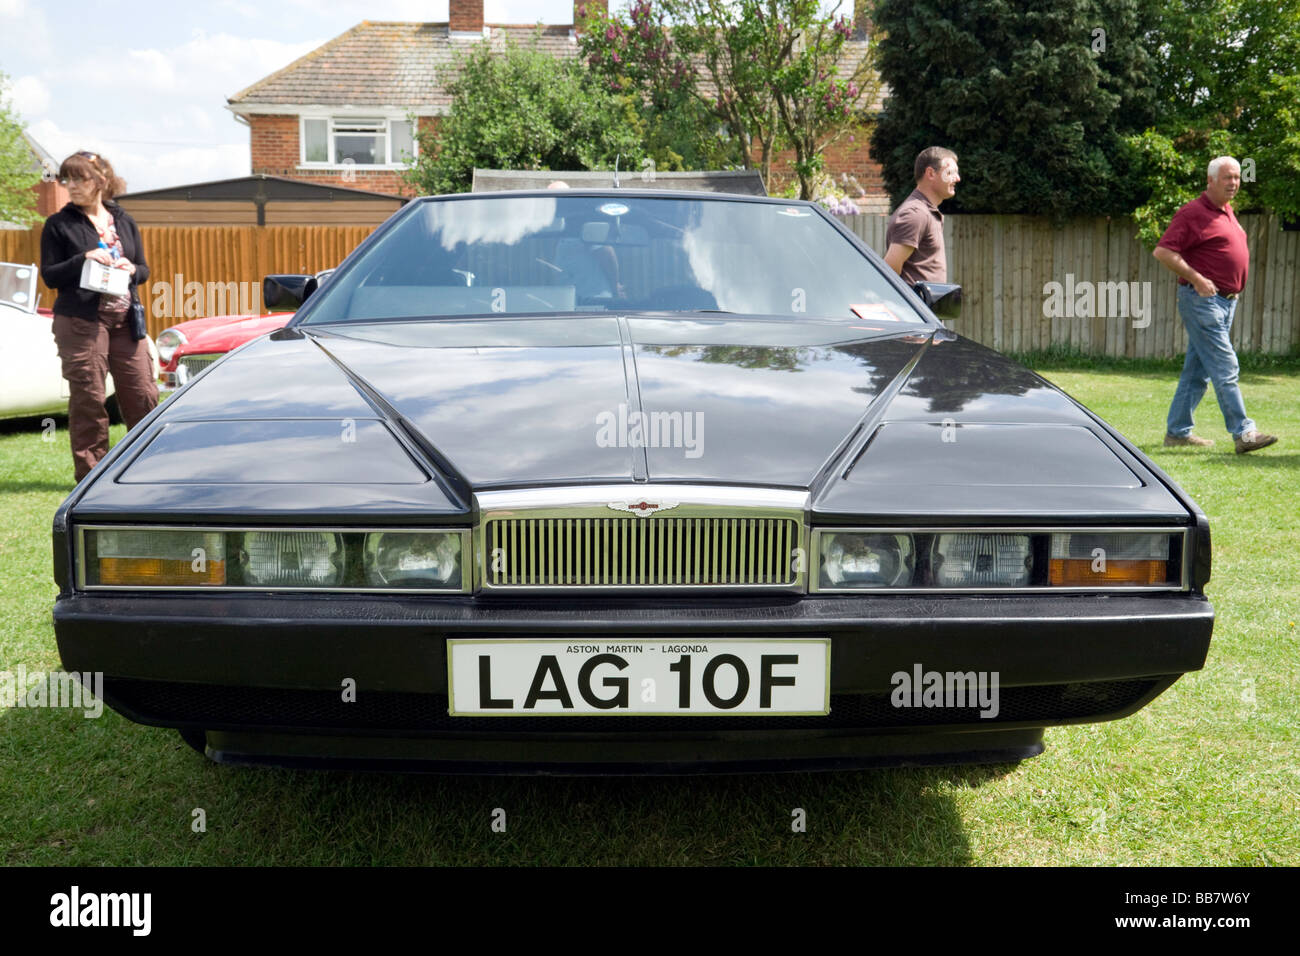 Aston Martin Lagonda Classic car, Wallingford Classic Car rally, Oxfordshire, UK - Stock Image